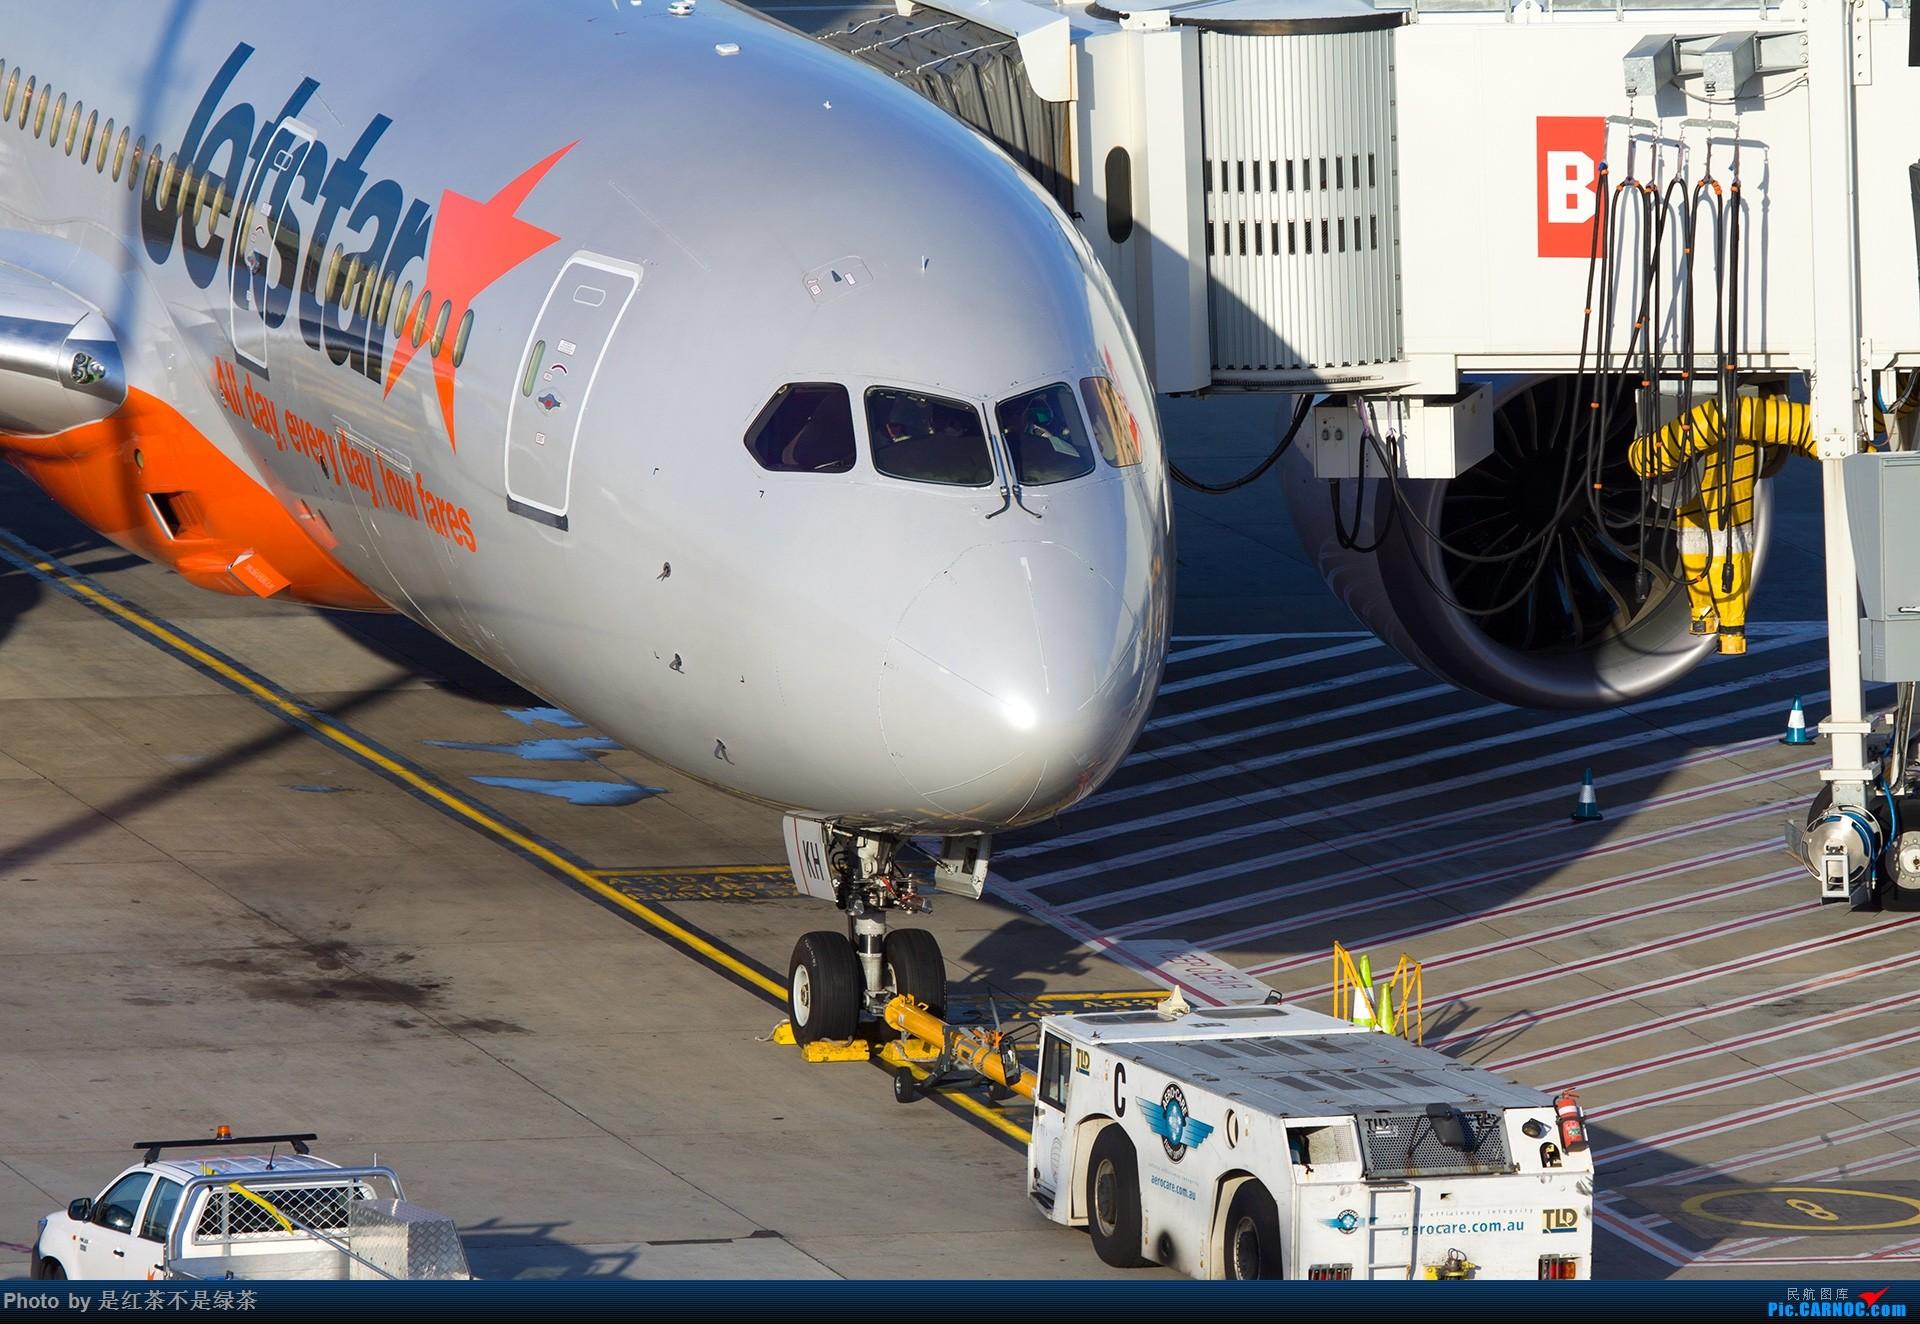 Re:[原创]【红茶拍机】澳洲行半日拍机,距离上次发帖居然有10个月了! BOEING 787-8 VH-VKH 澳大利亚悉尼金斯福德·史密斯机场